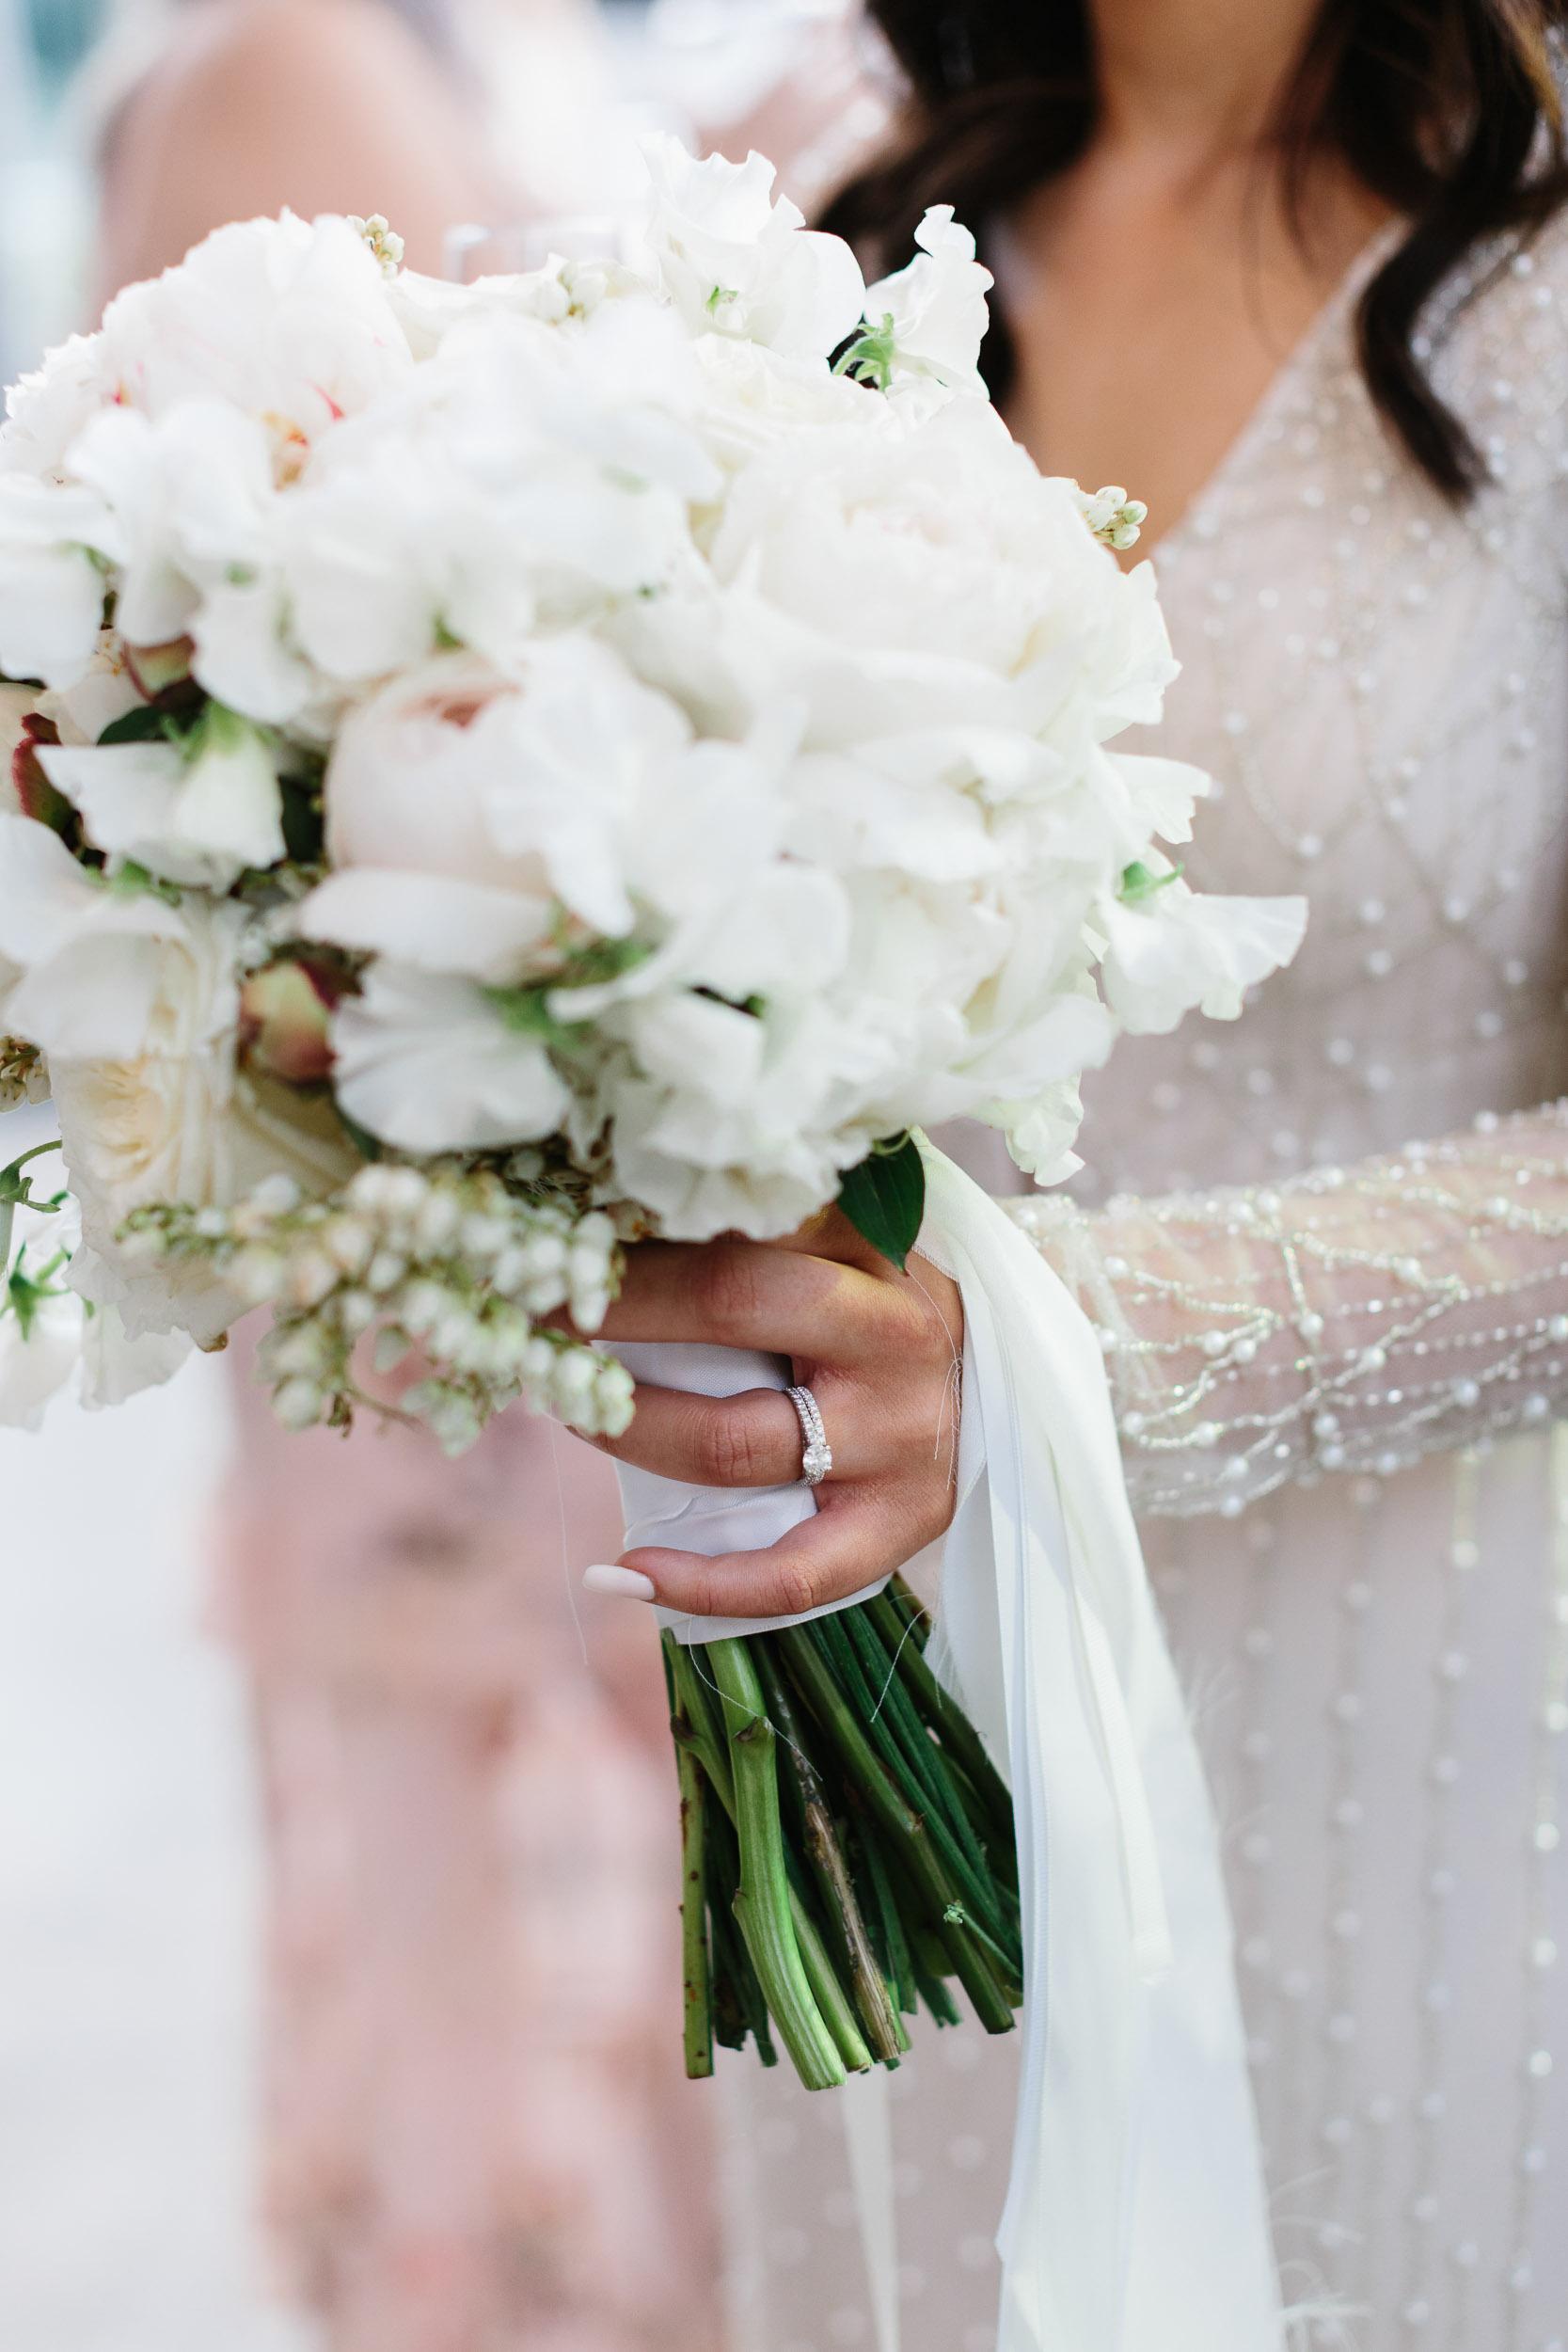 Kas-Richards-Wedding-Photographer-Melbourne-City-Wedding-Alto-Event-Space-Jane-Hill-Bridal-Gown-55.jpg